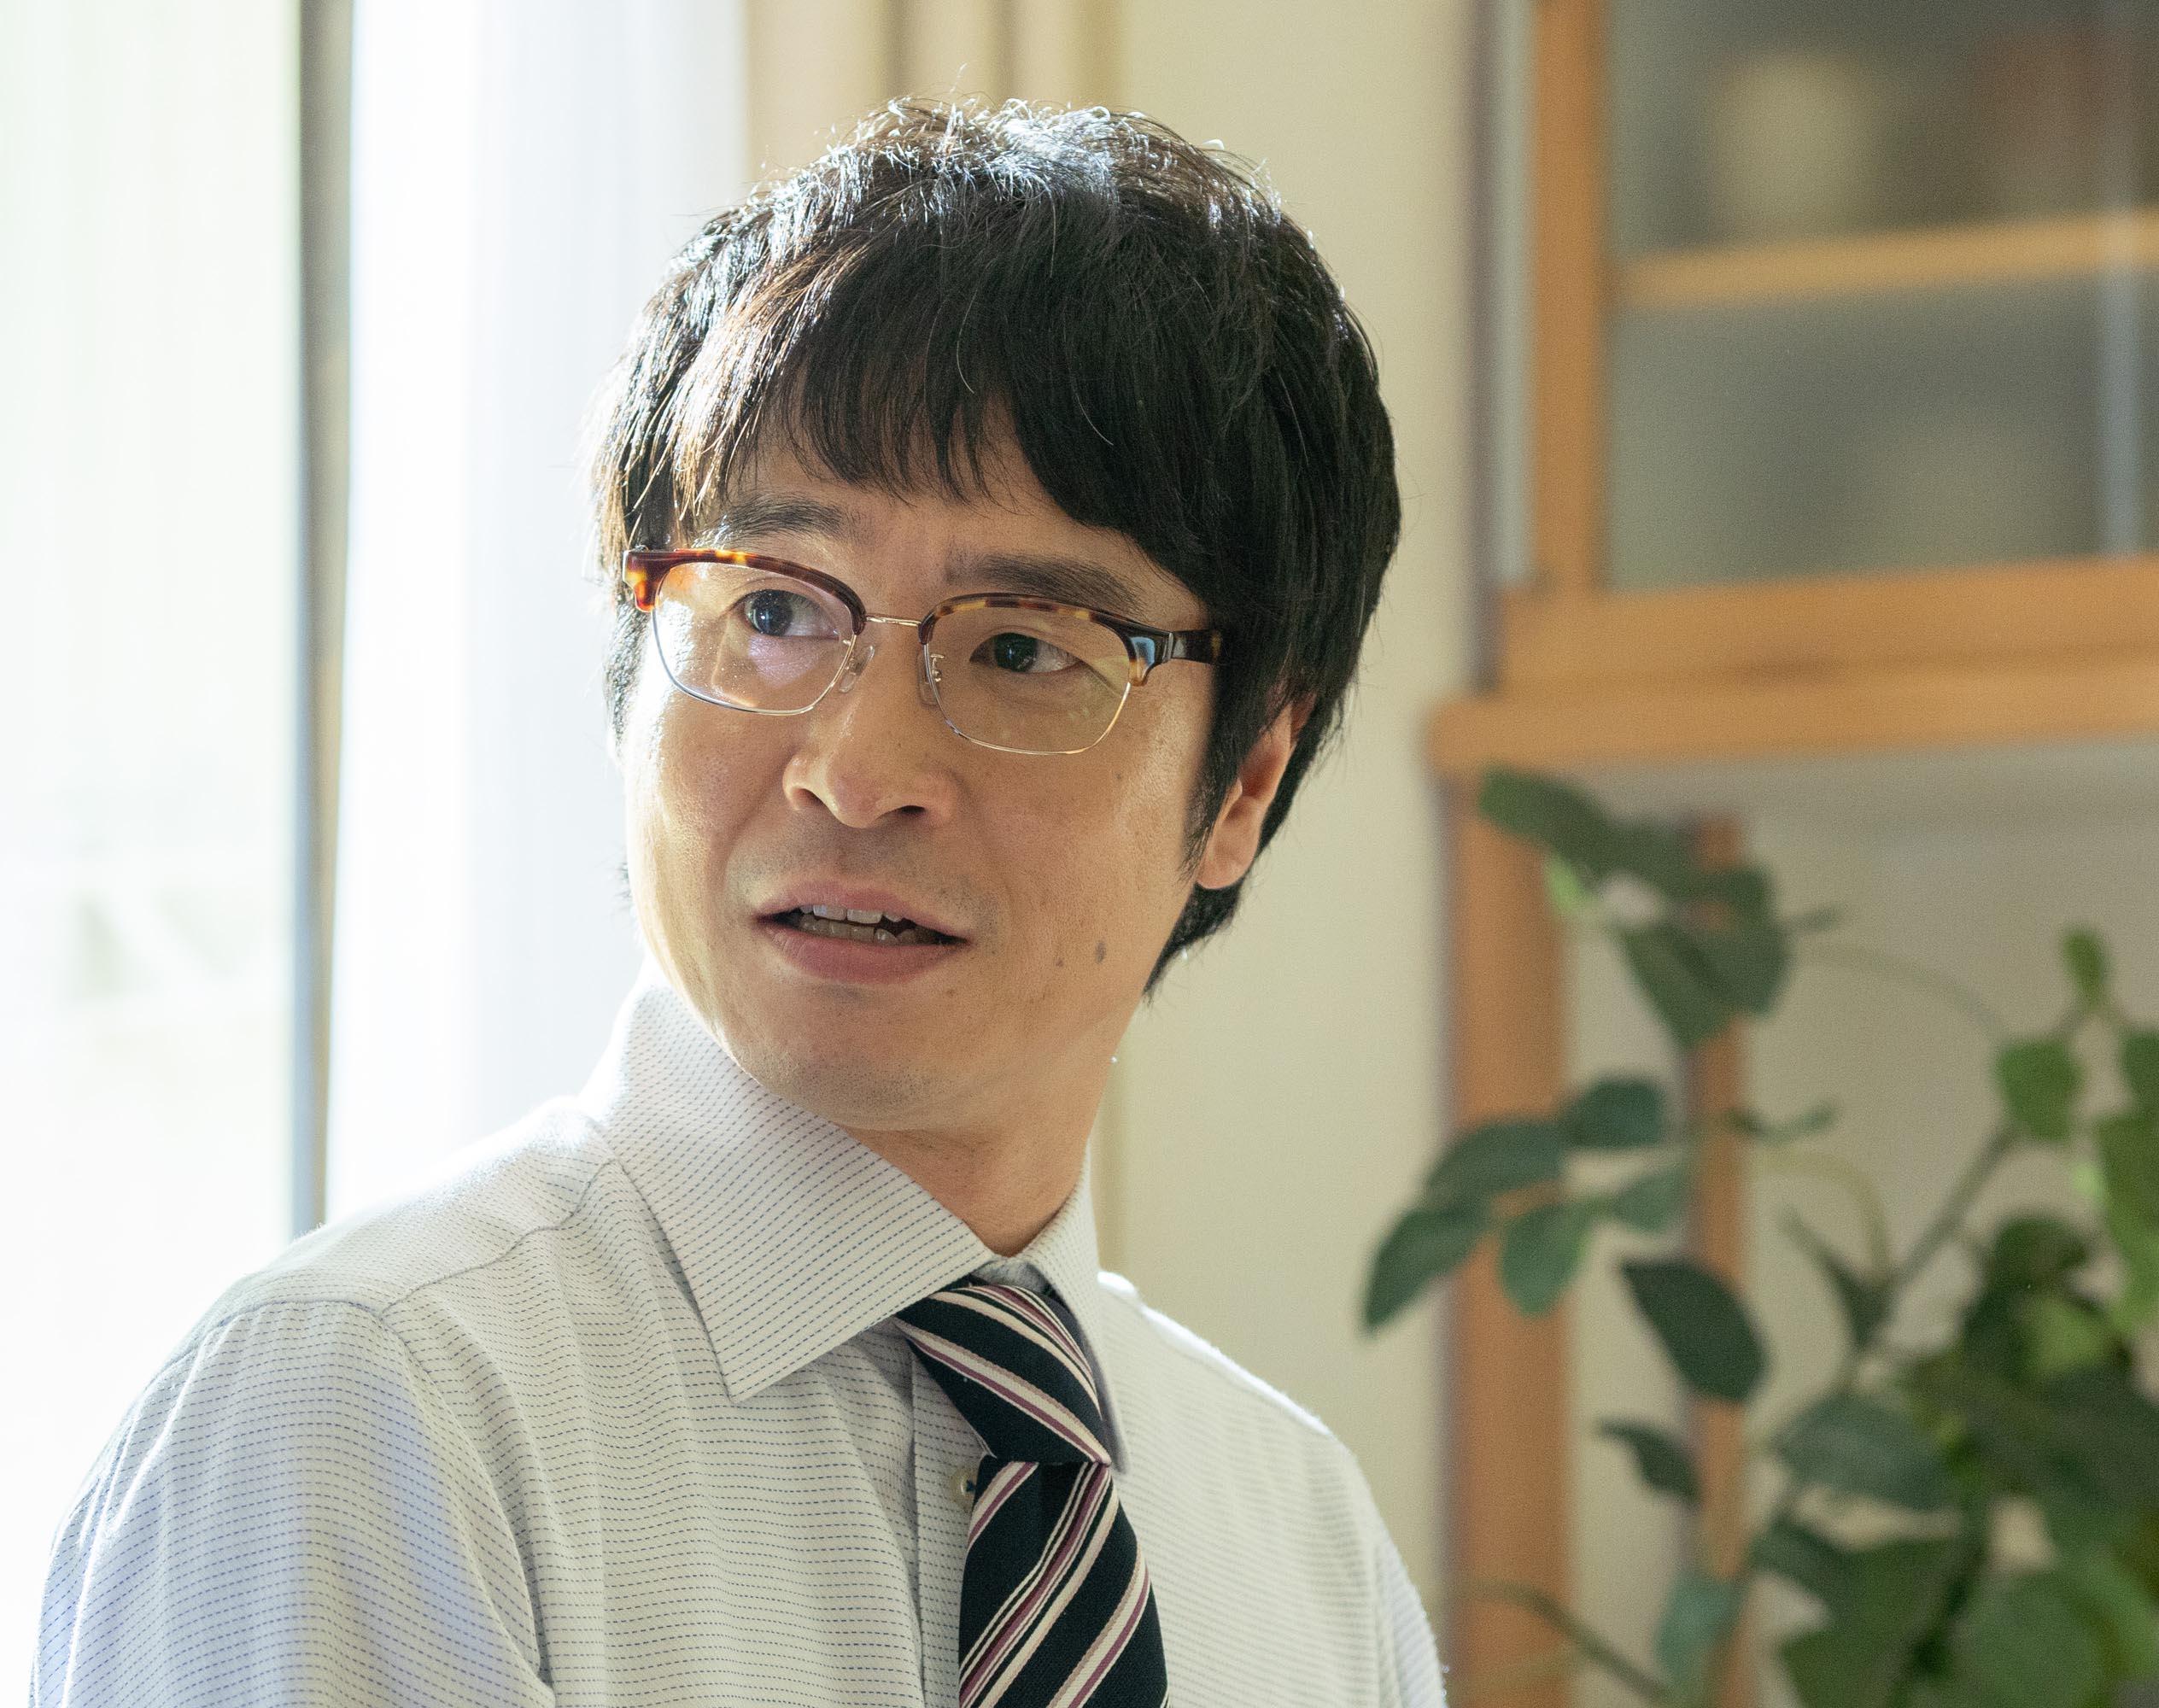 http://news.yoshimoto.co.jp/20180807140308-a522af9ac4490459c5fe1f34d690d1c5ede6cc94.jpg